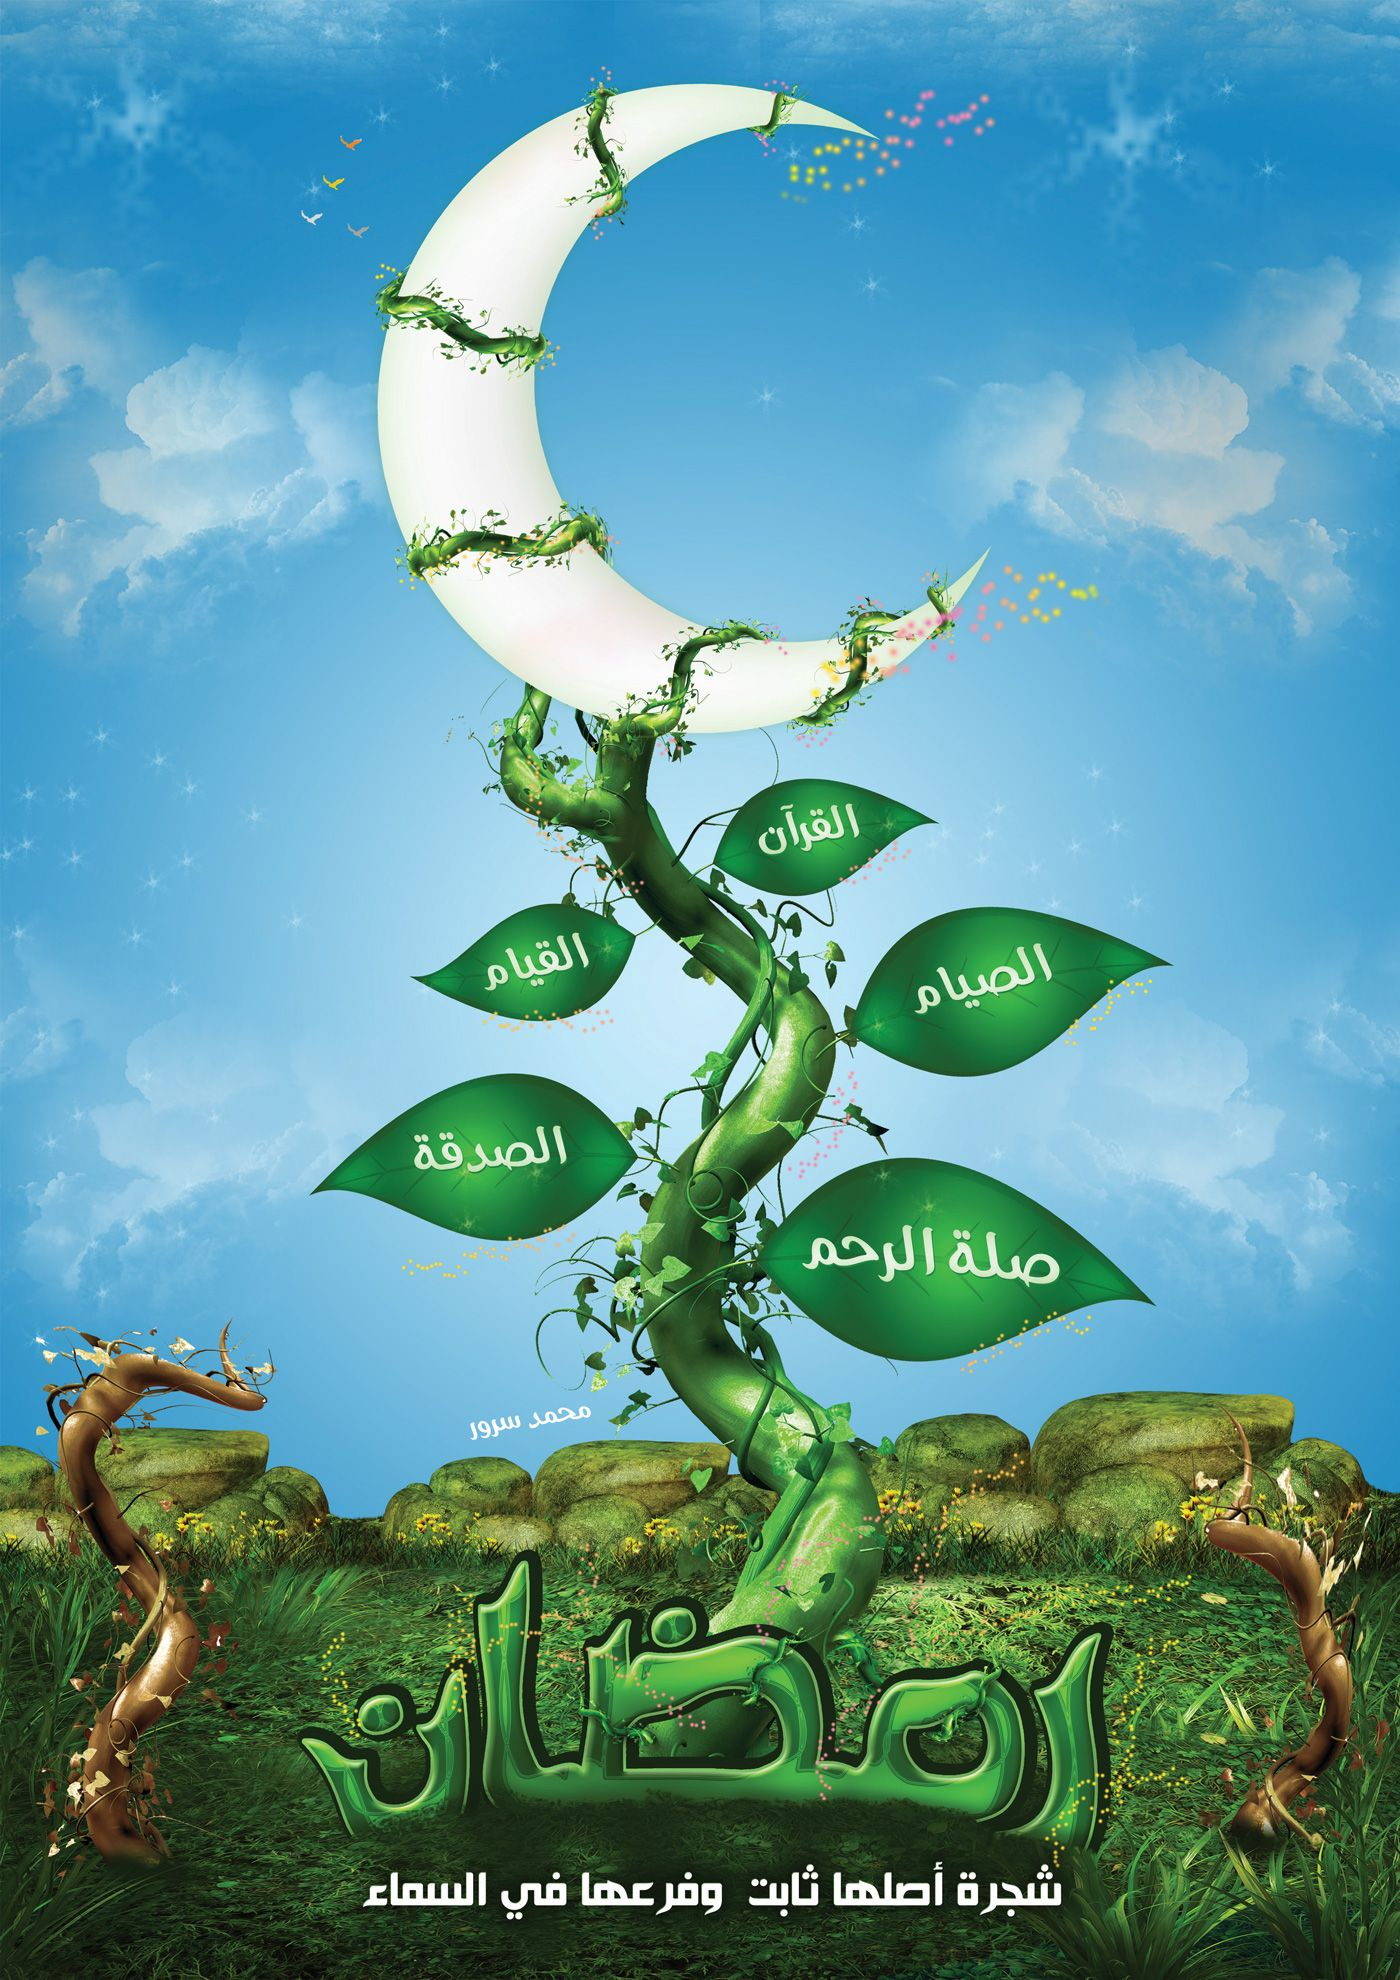 Ramadan Tree By Allam Art On Deviantart Ramadan Ramadan Mubarak Wallpapers Ramadan Wallpaper Hd